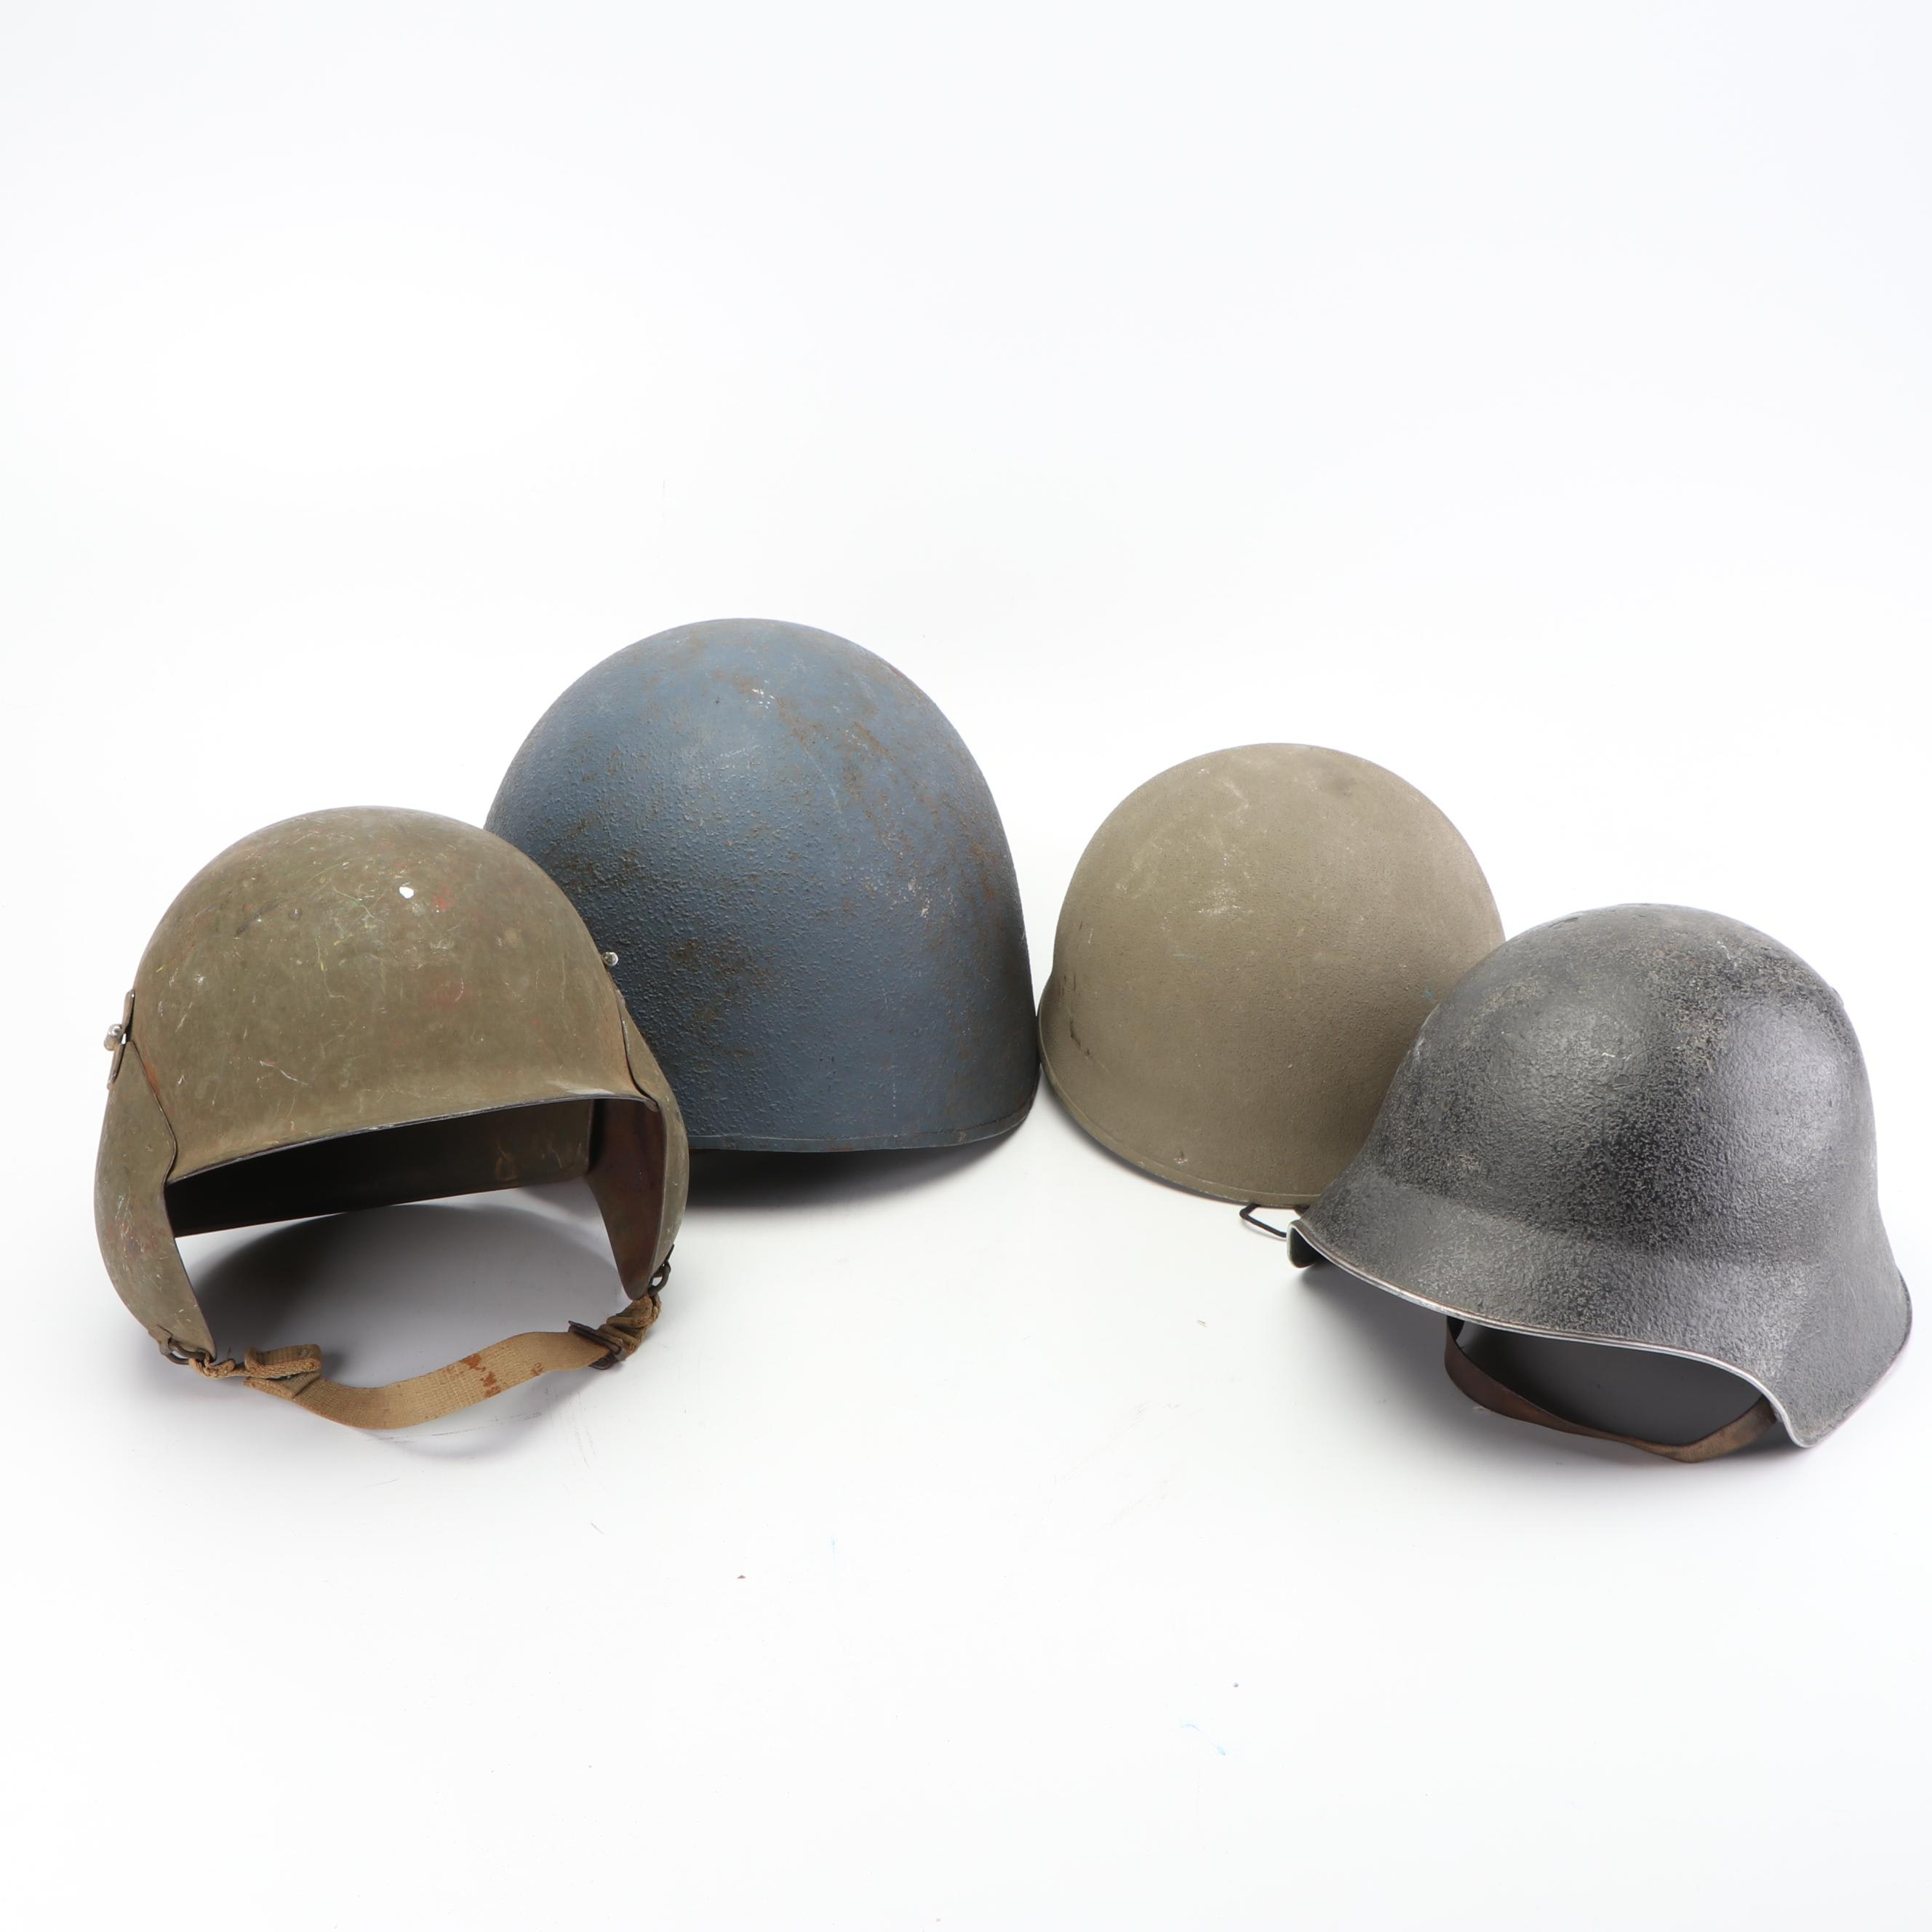 Assorted Military Hard Shell Field Helmets